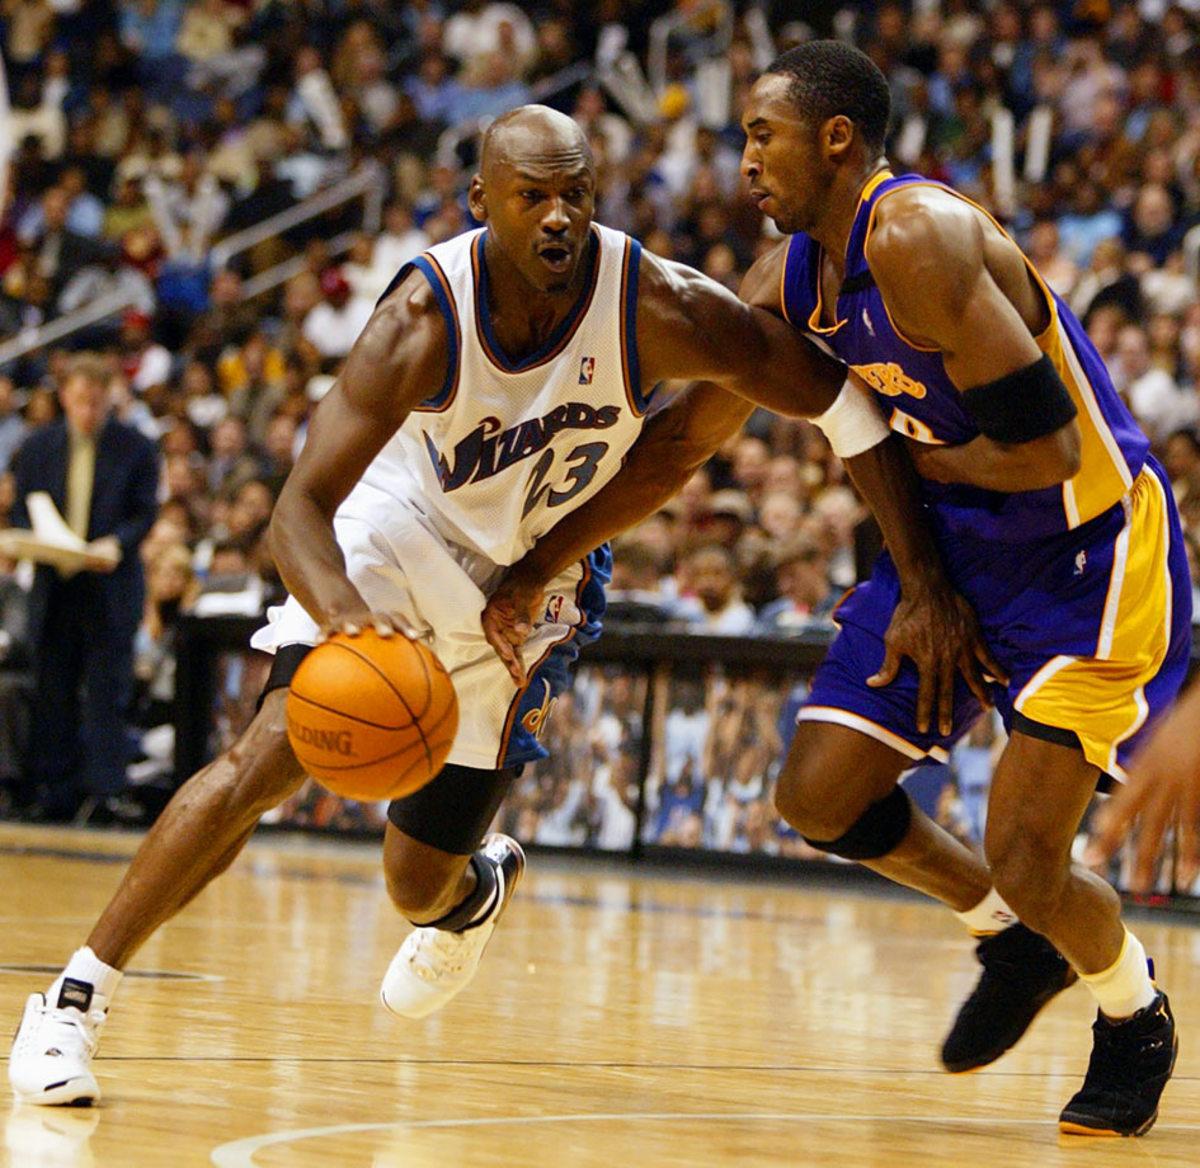 2002-1108-Michael-Jordan-Kobe-Bryant-001081290.jpg